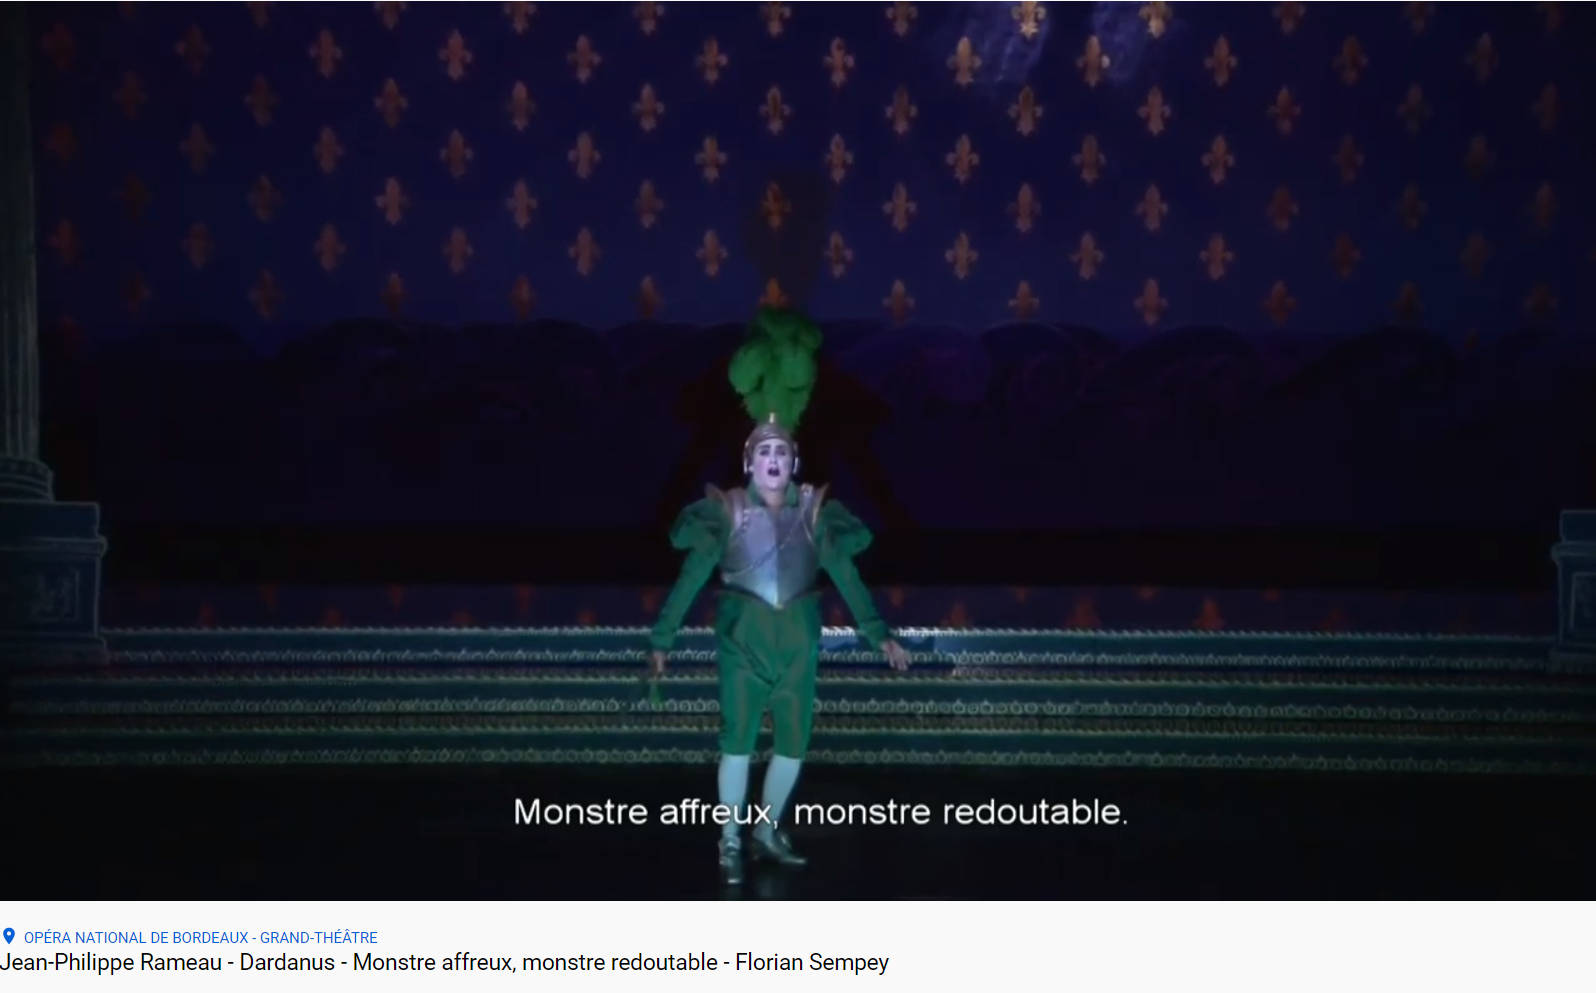 Rameau Dardanus mostre affreux monstre redoutable